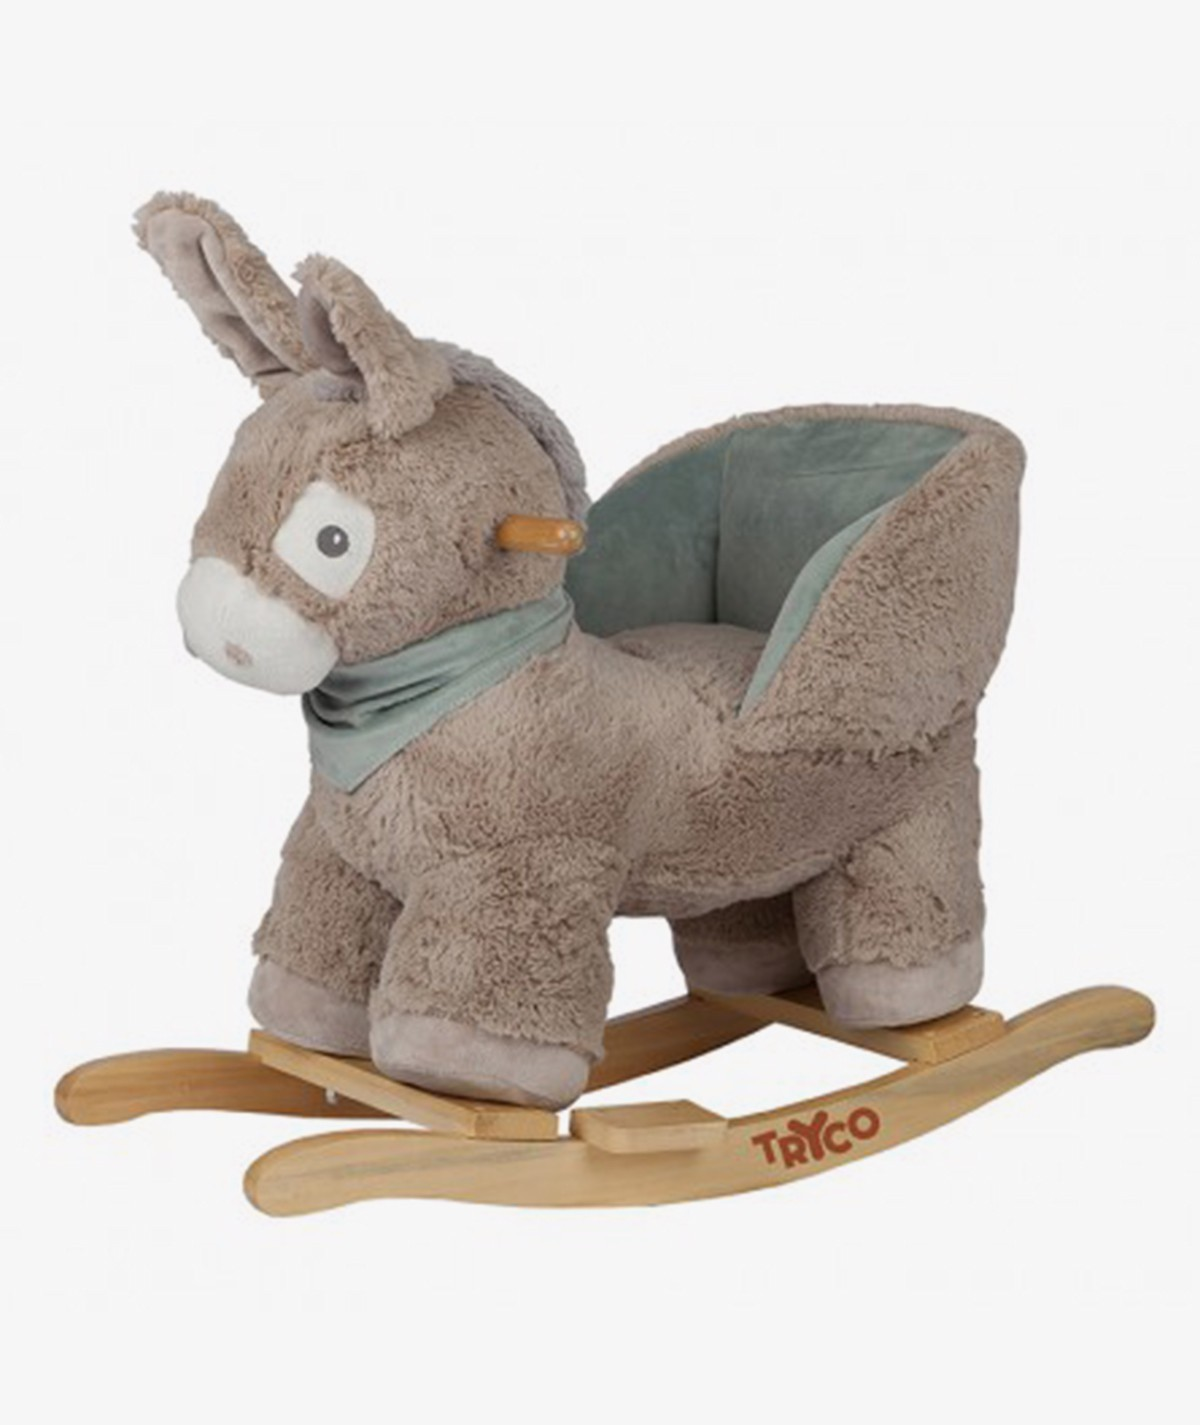 Rocking Chair Donkey Duke